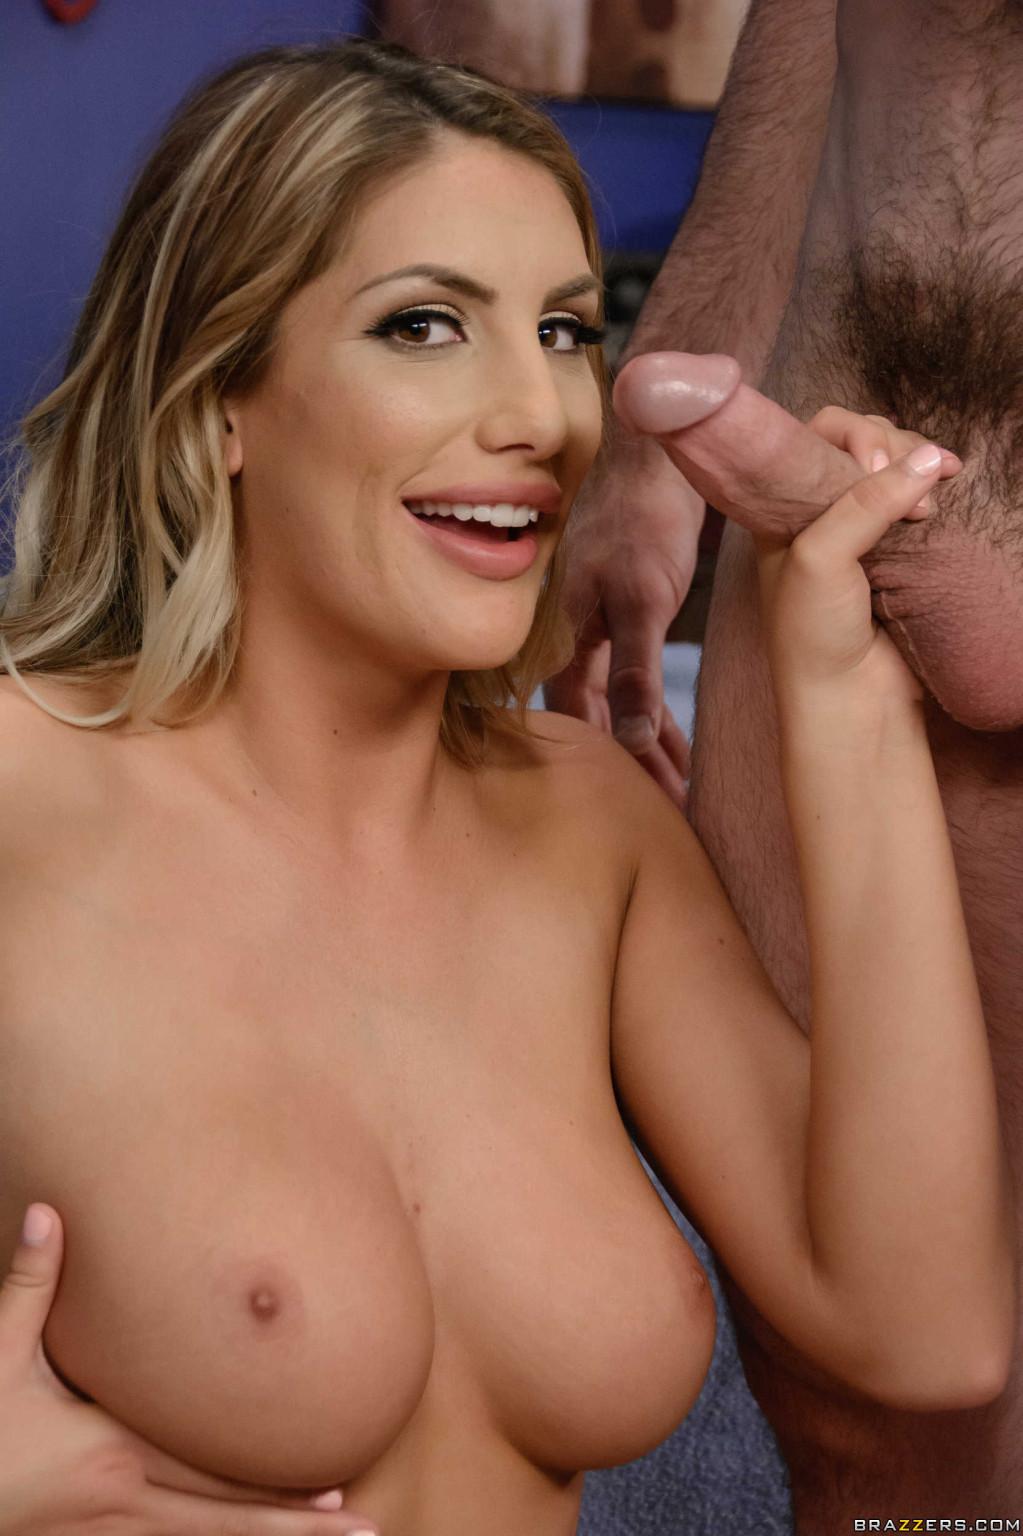 Amazing shemale sex pics